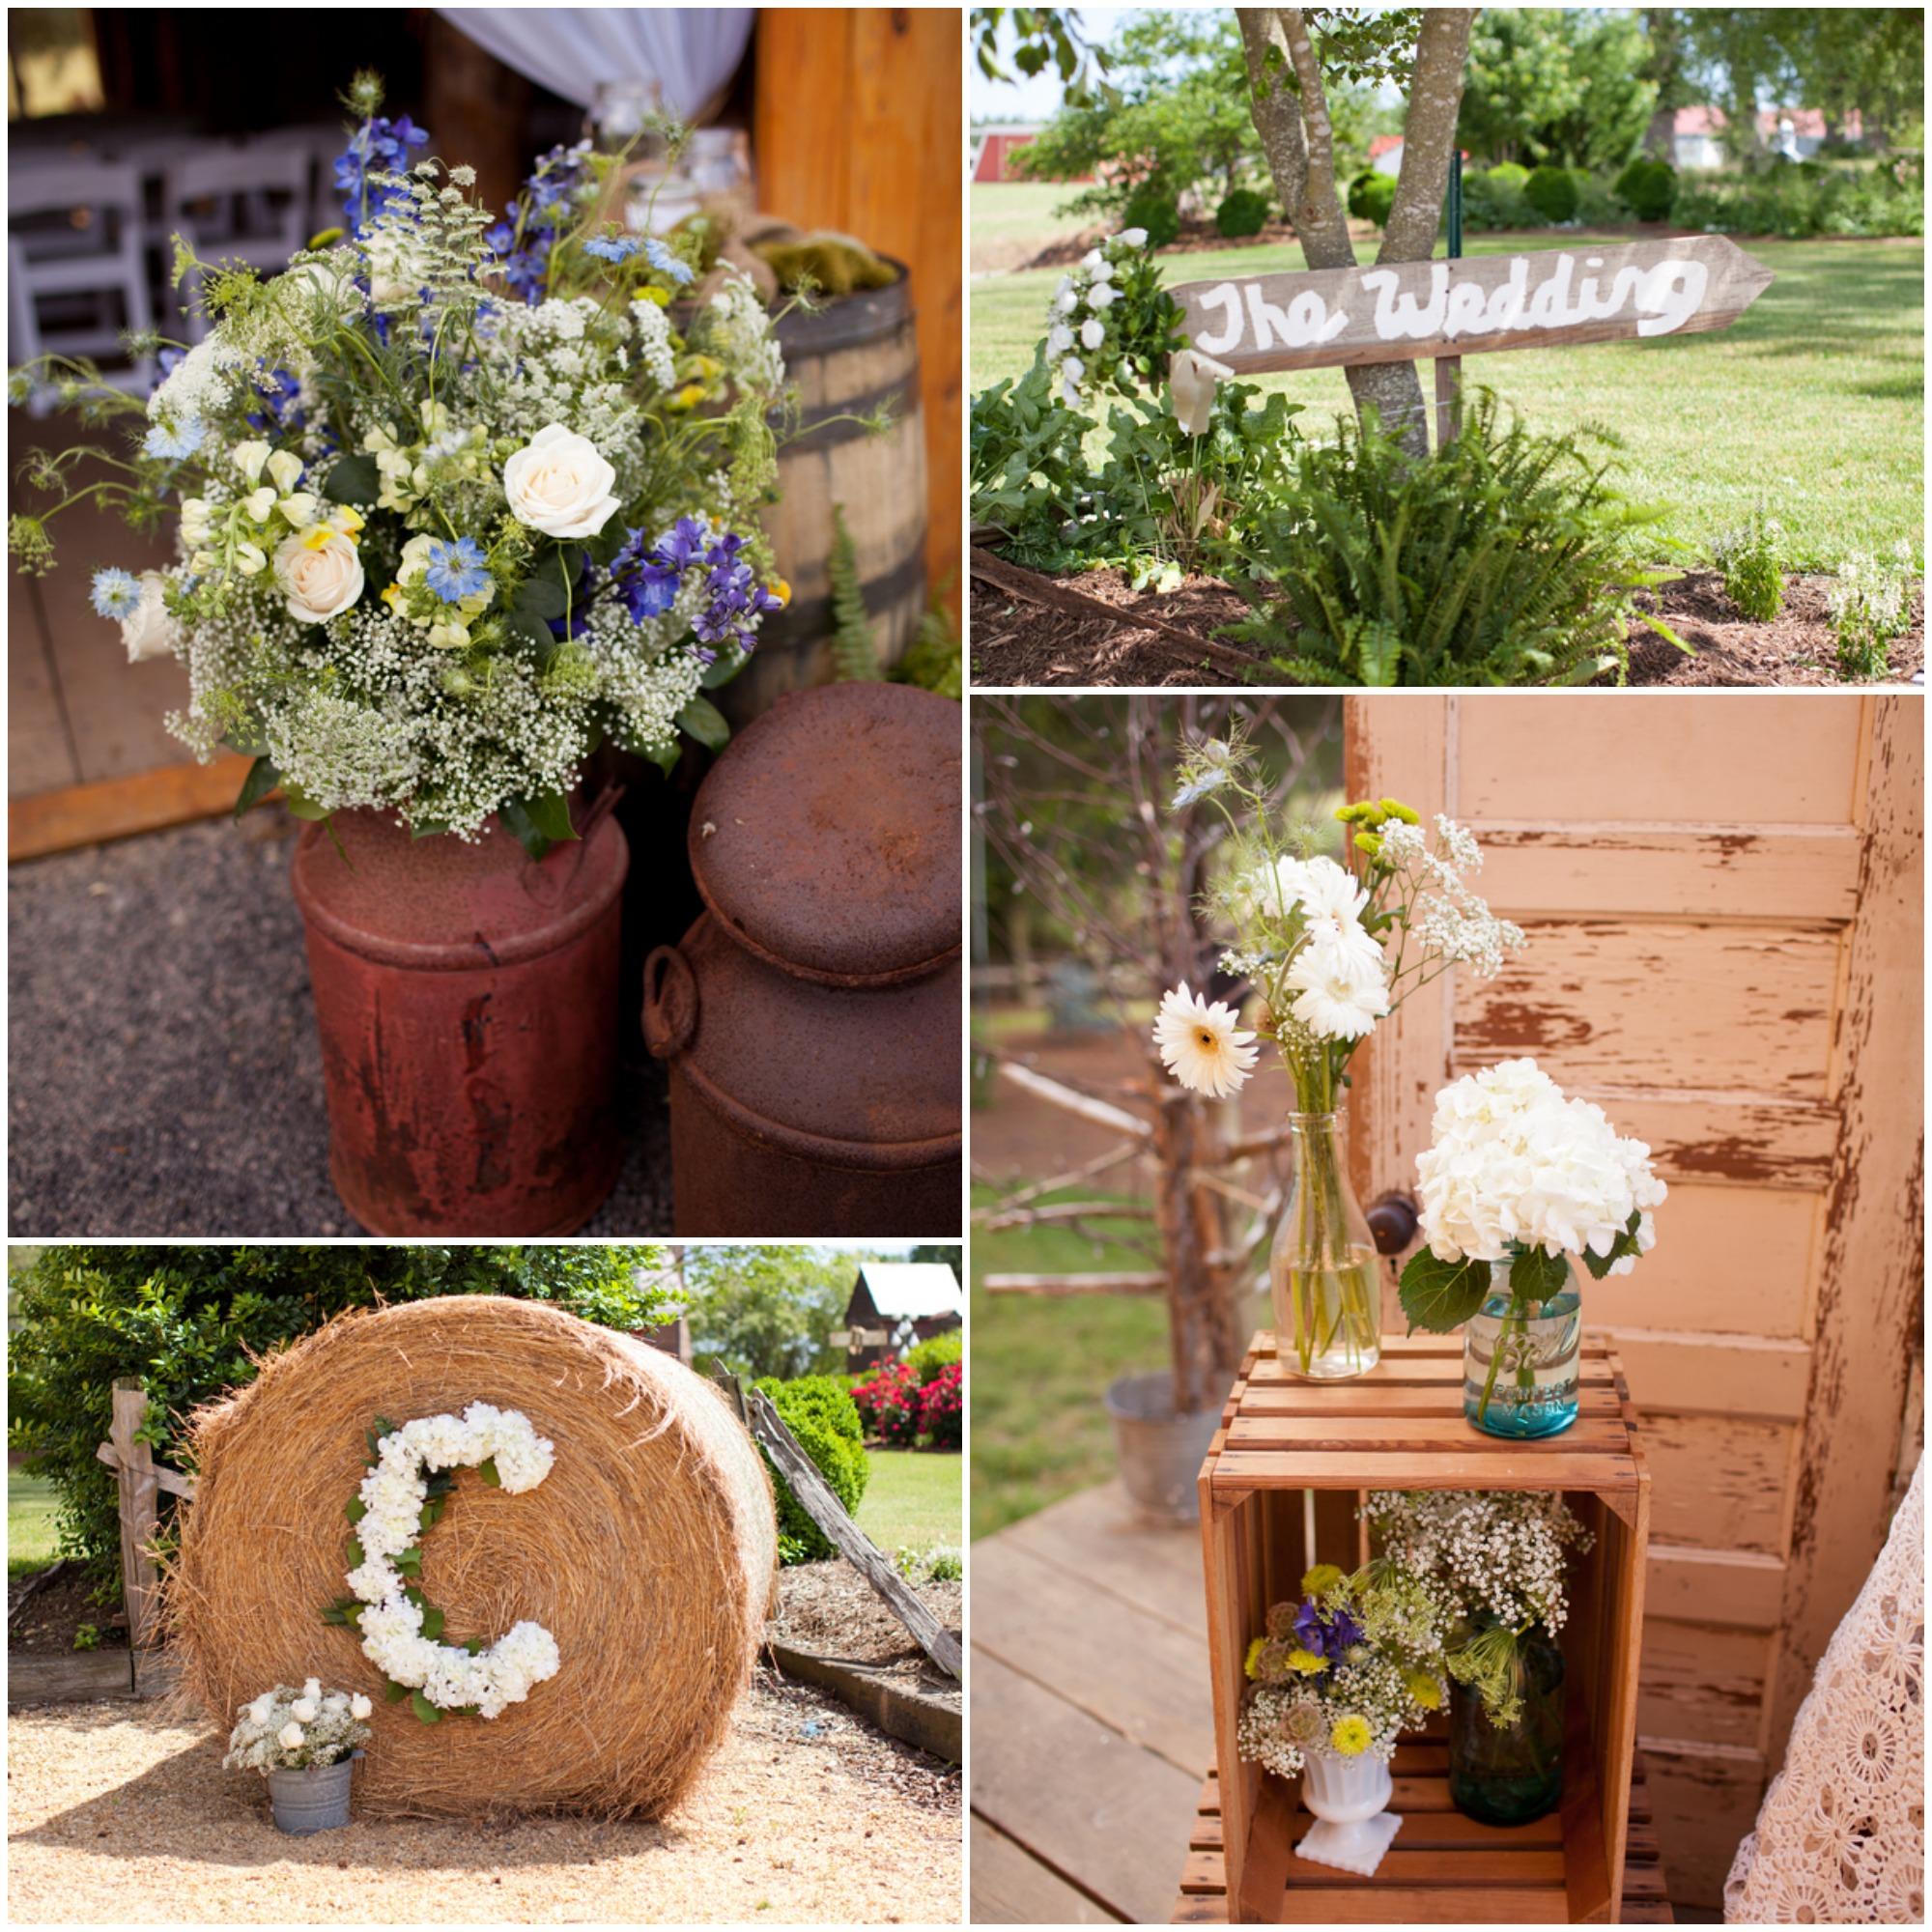 Rustic Wedding: Rustic Country Weddings